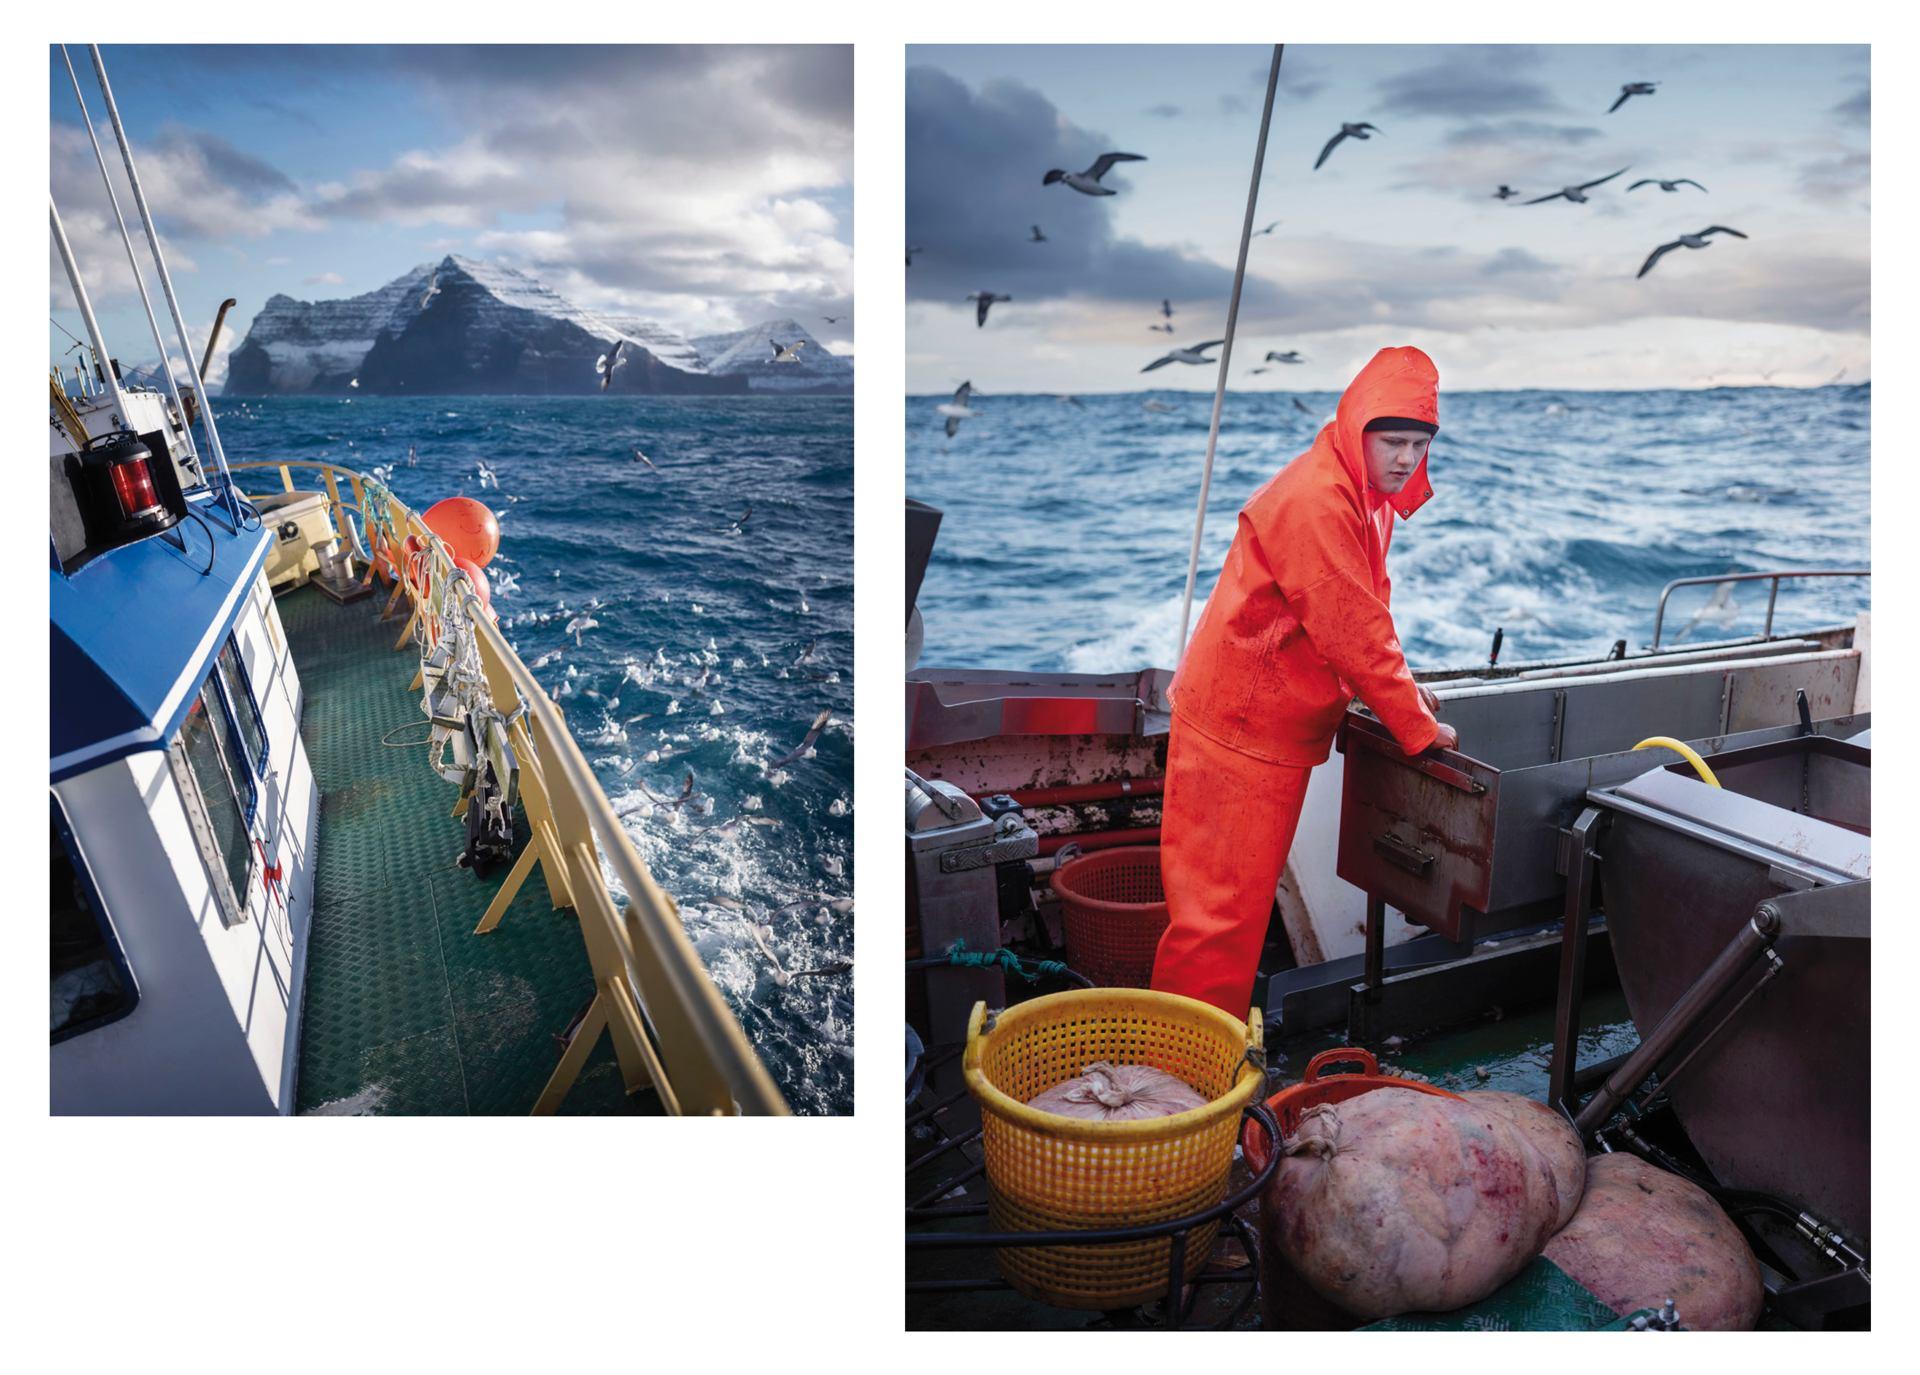 Fisherman & its boat